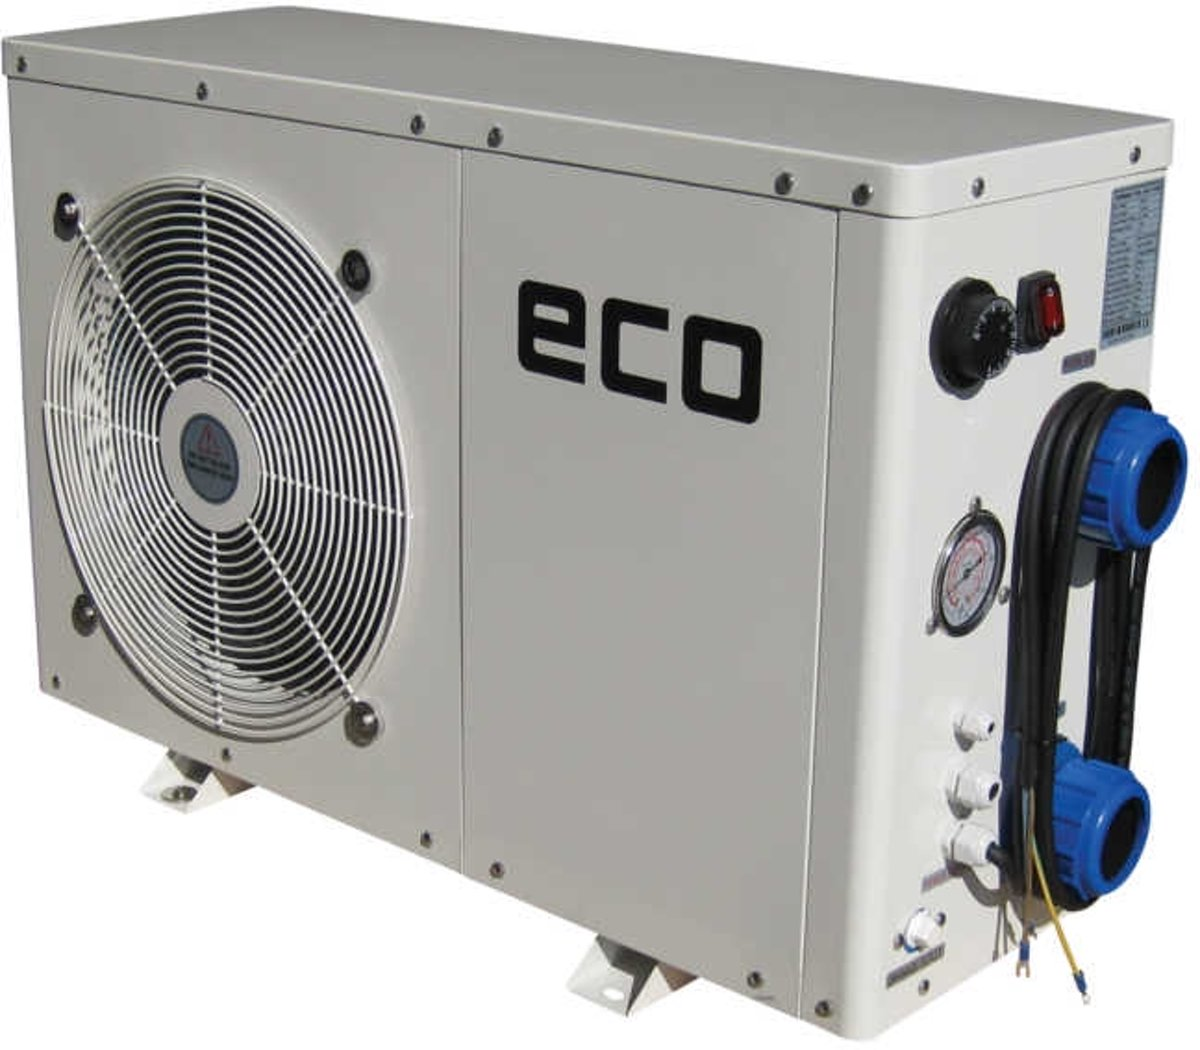 Warmtepomp ECO 10 KW